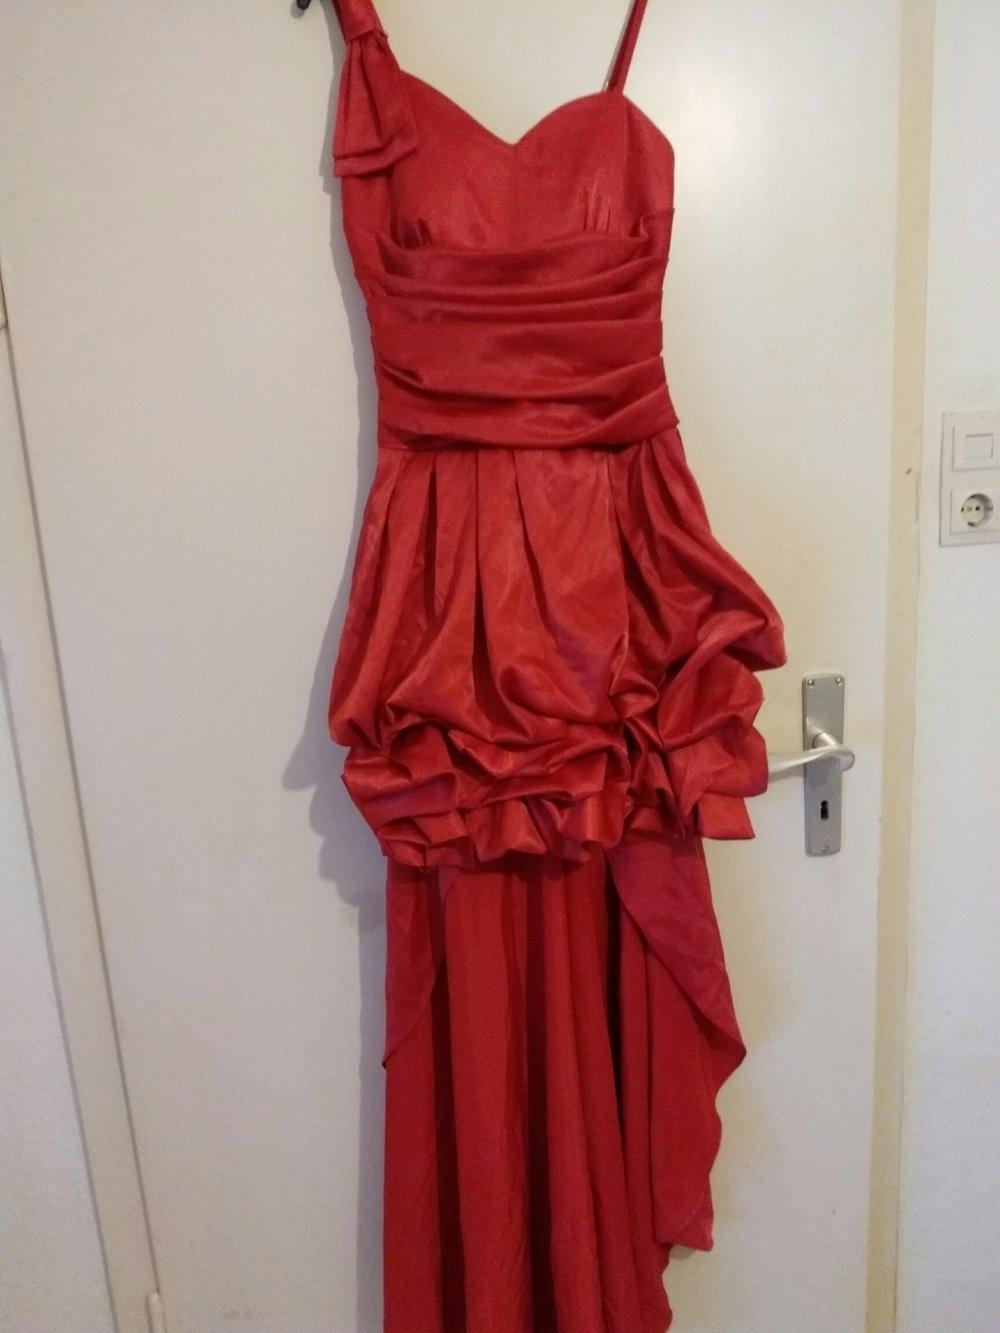 Abend Perfekt Rotes Abendkleid SpezialgebietFormal Luxurius Rotes Abendkleid Galerie